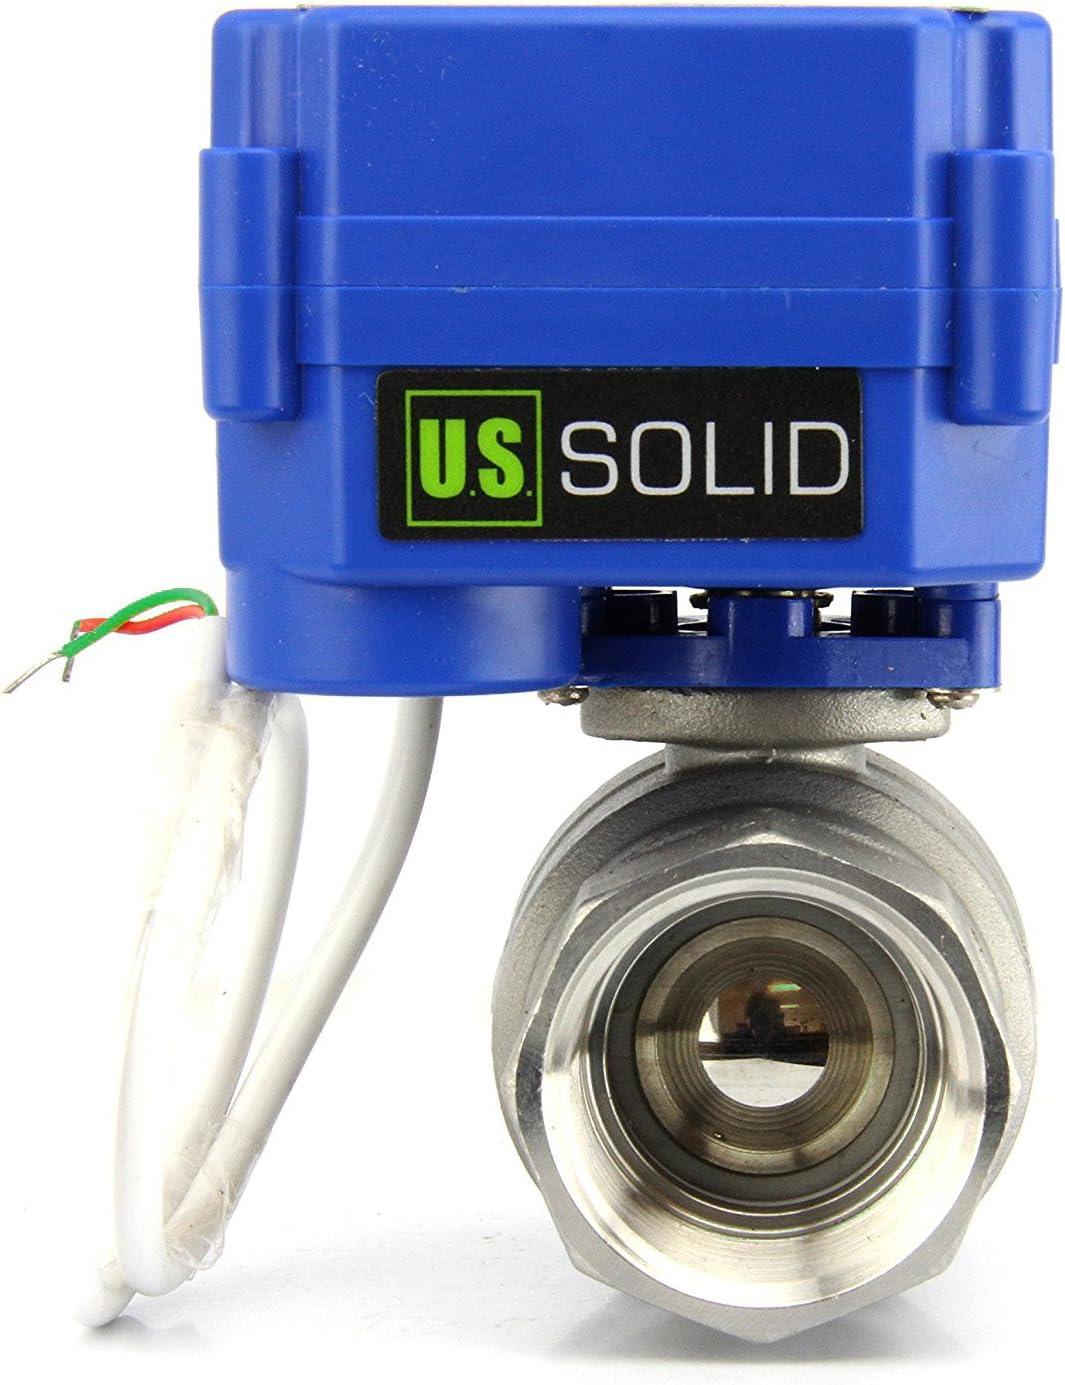 U.S. Solid 1